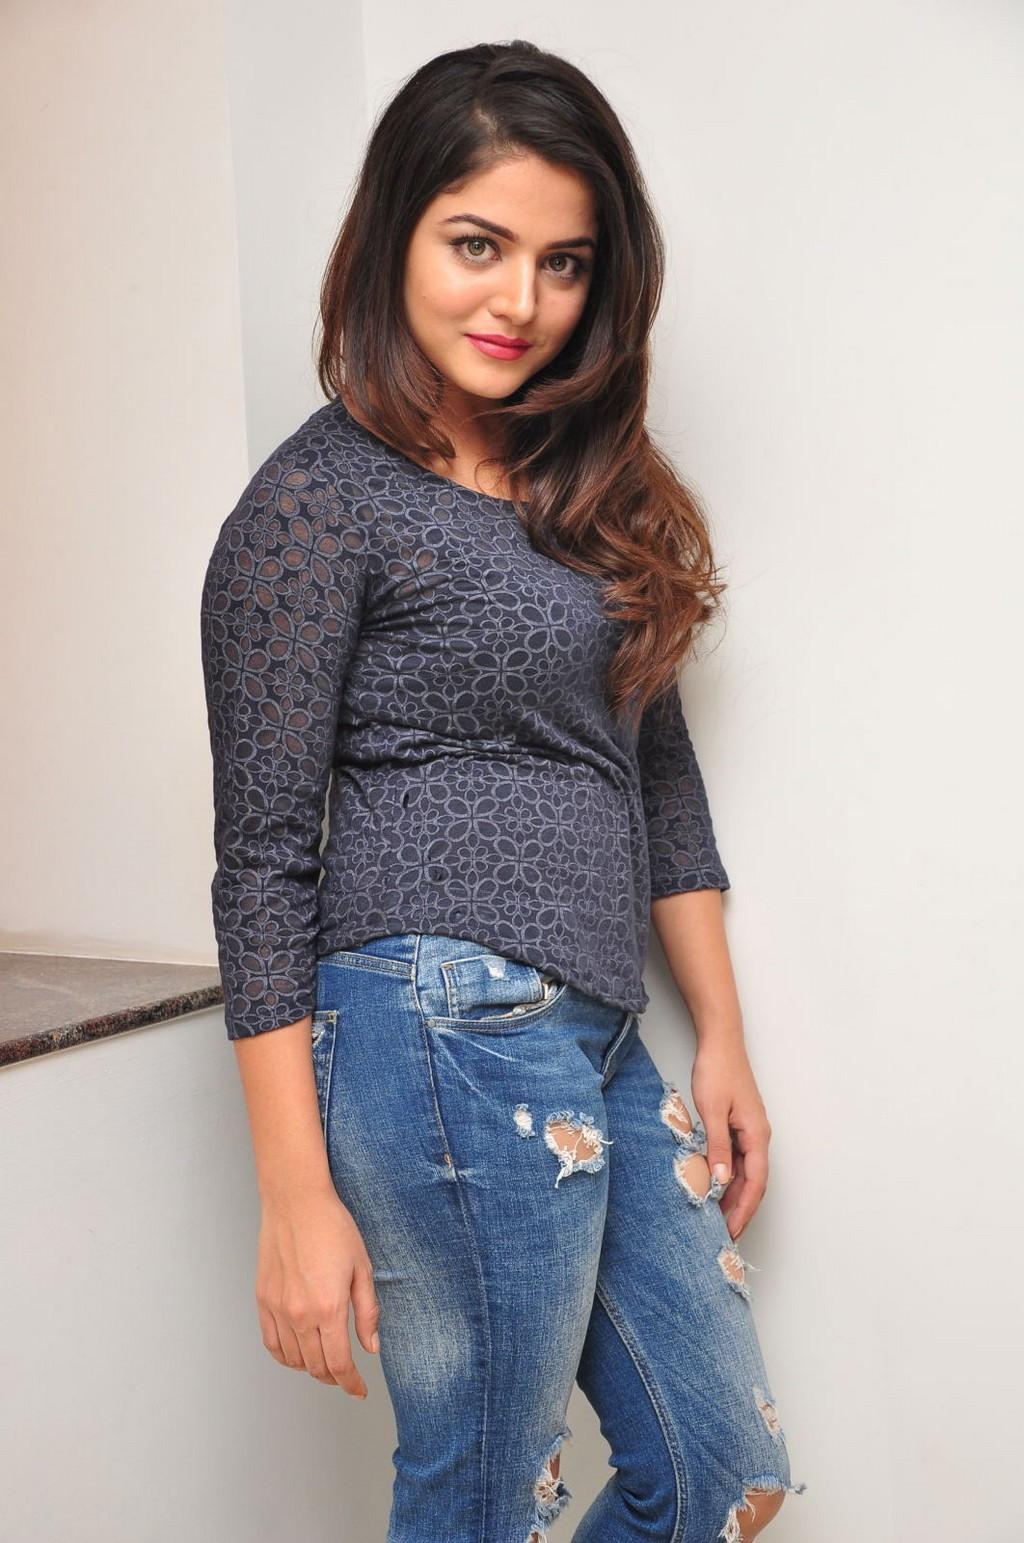 Glamours Tollywood Actress Wamiqa Gabbi Hot Stills In Black Top Blue Jeans